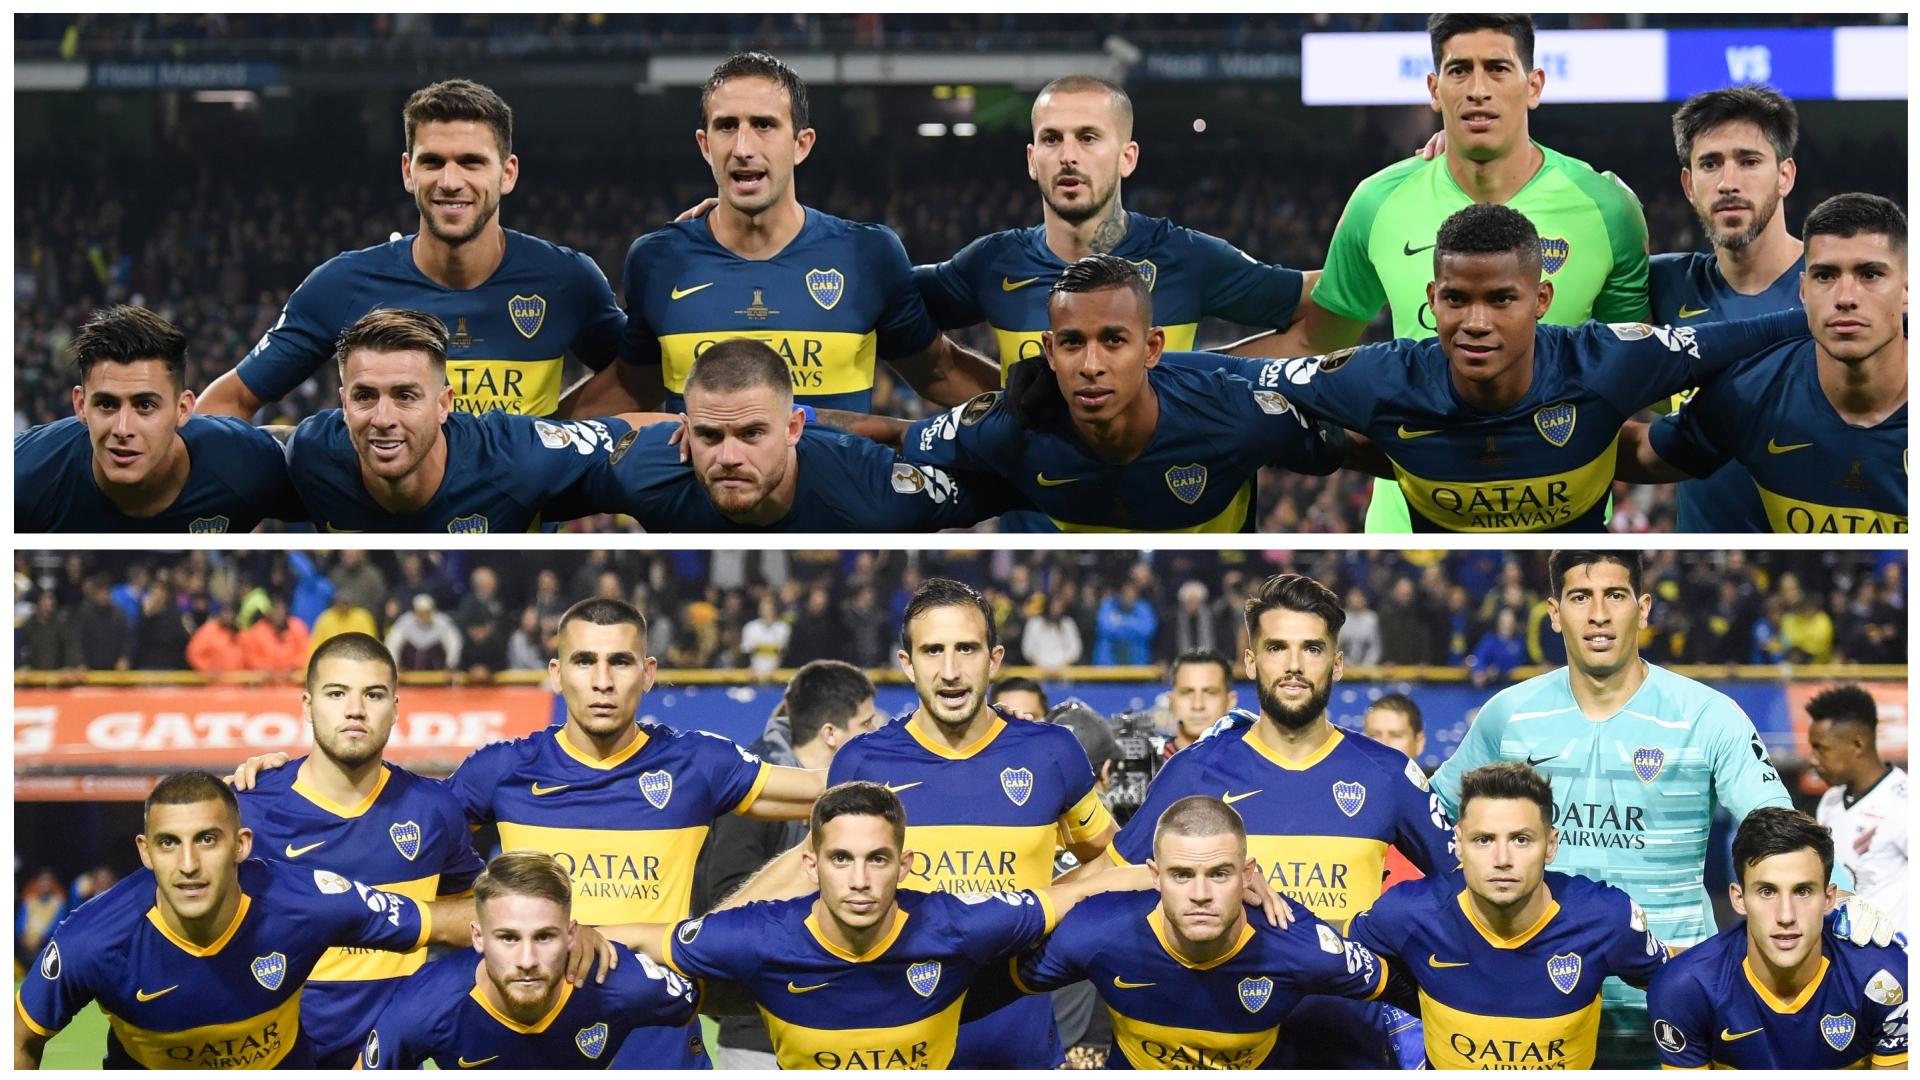 Boca final Copa Libertadores 2018 Boca Paranaense 2019